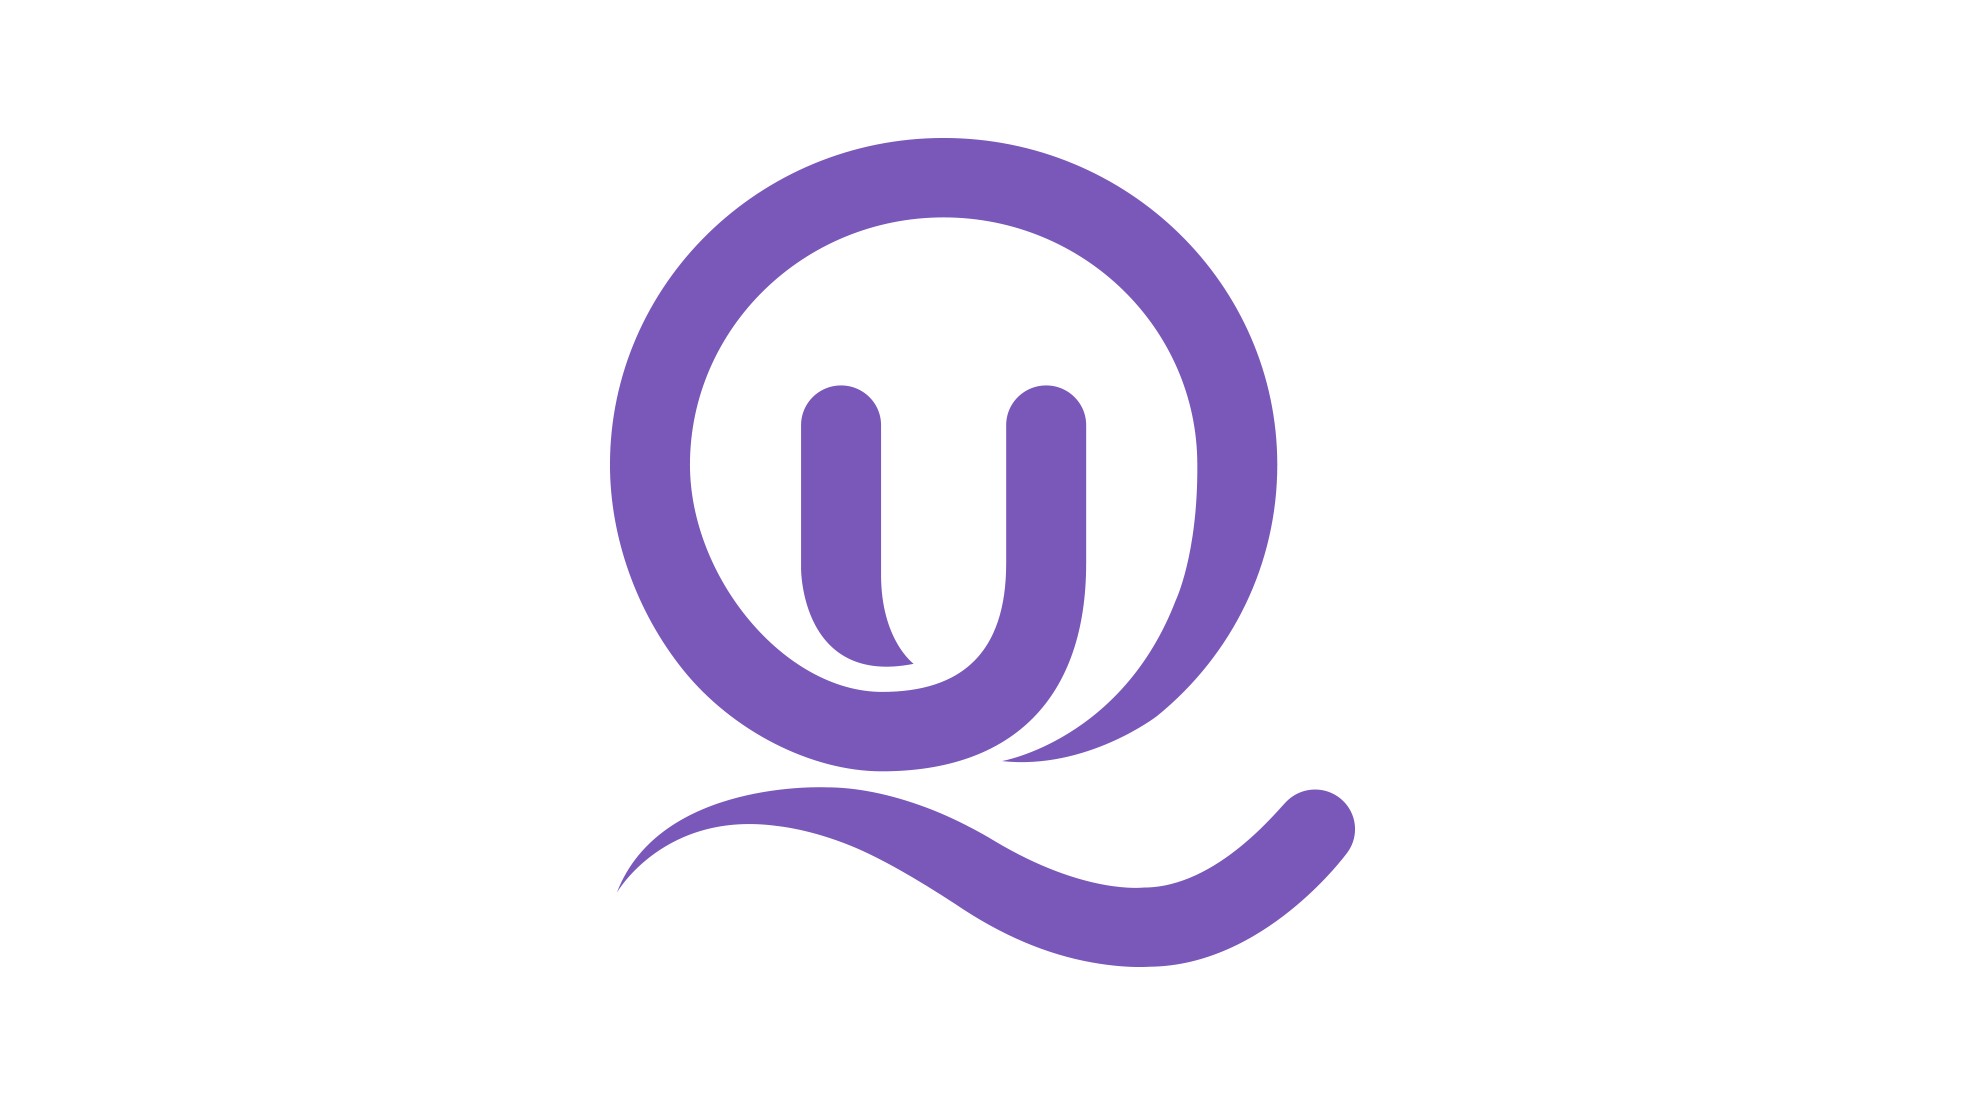 Qunify logomark